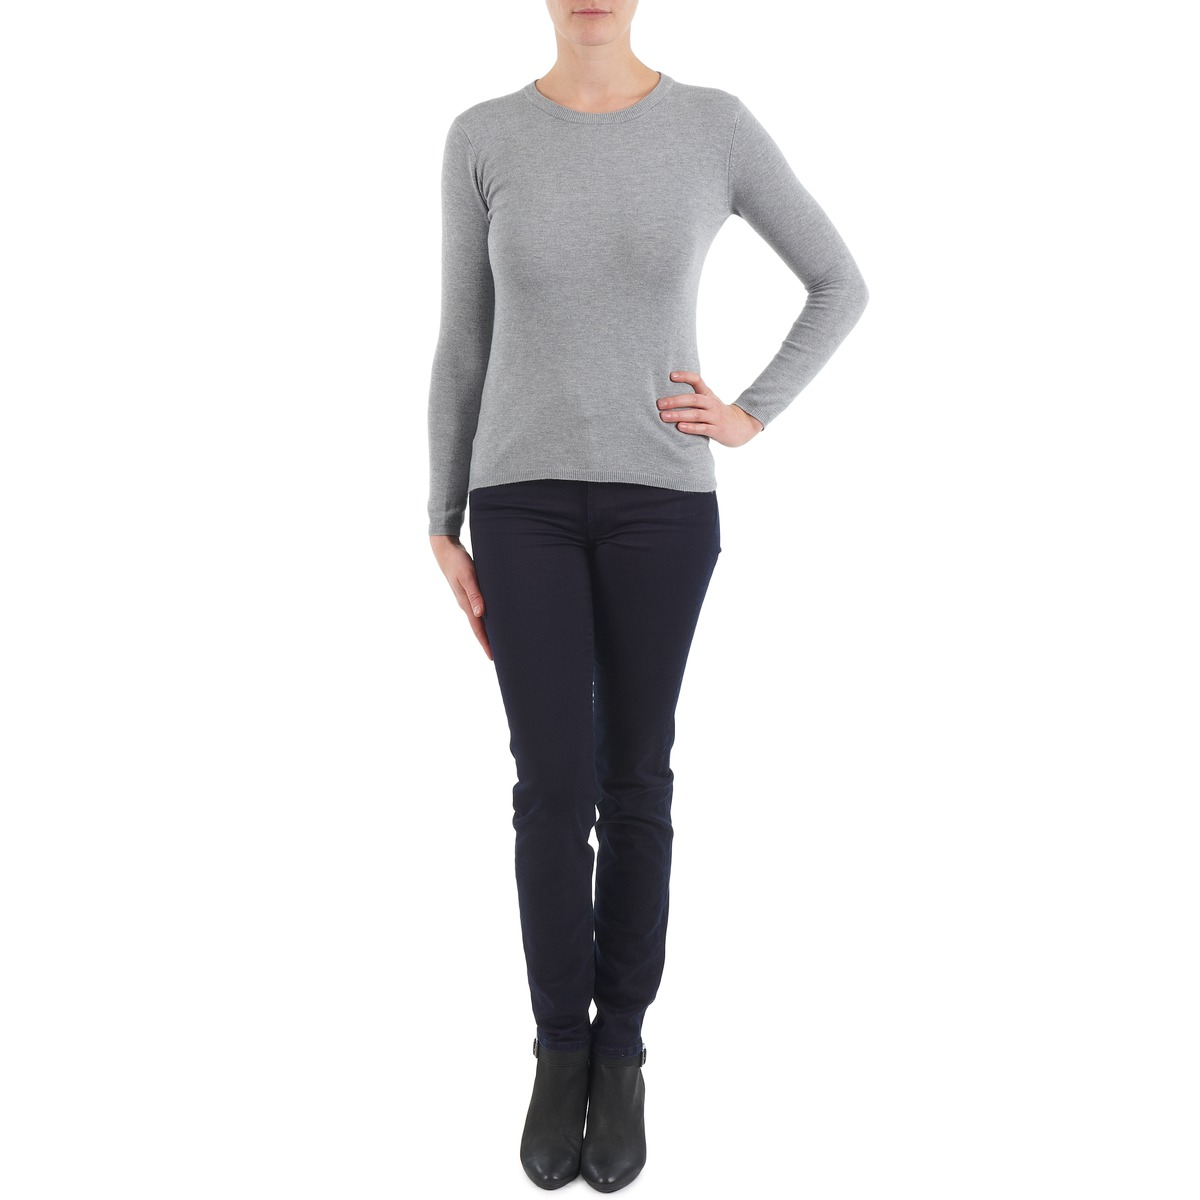 7 for all mankind  gummy  women's skinny jeans in black